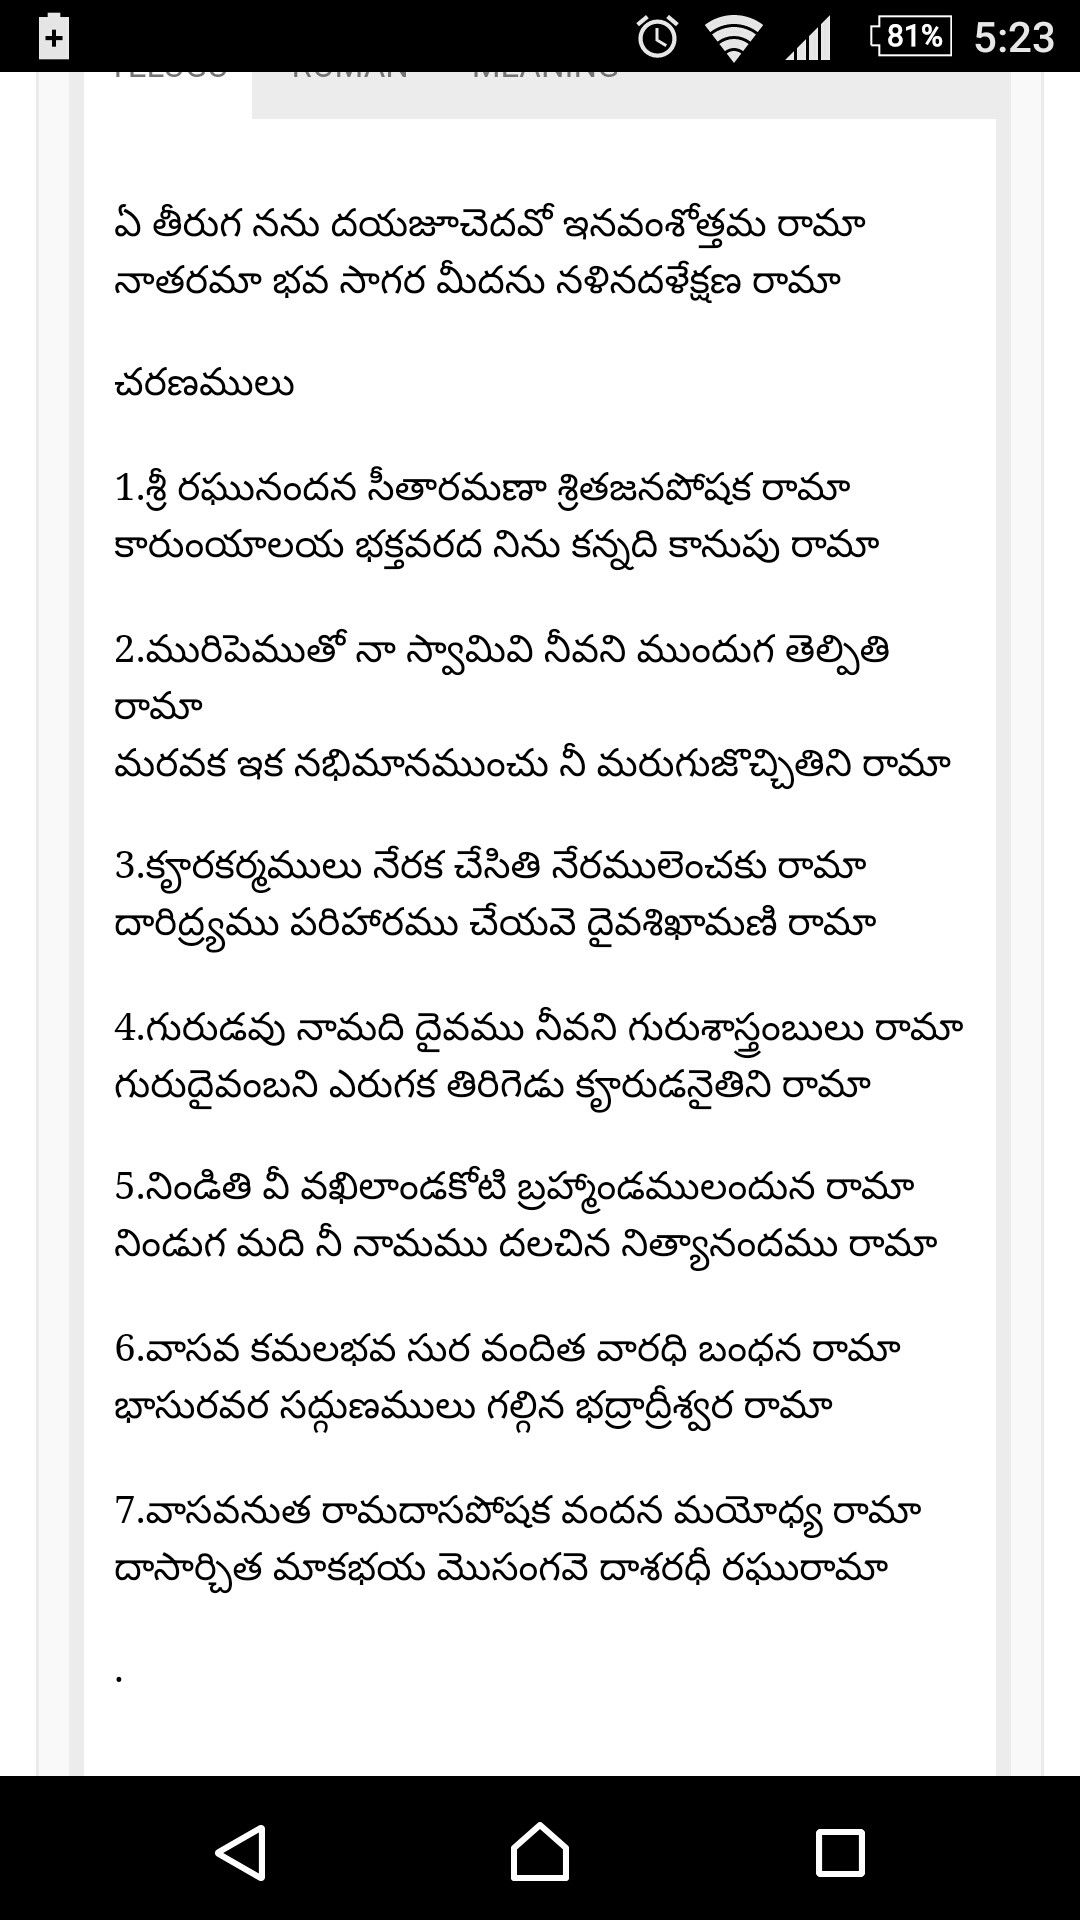 Pin by Padma Tummalapalli on Telugu songs lyrics in 2019